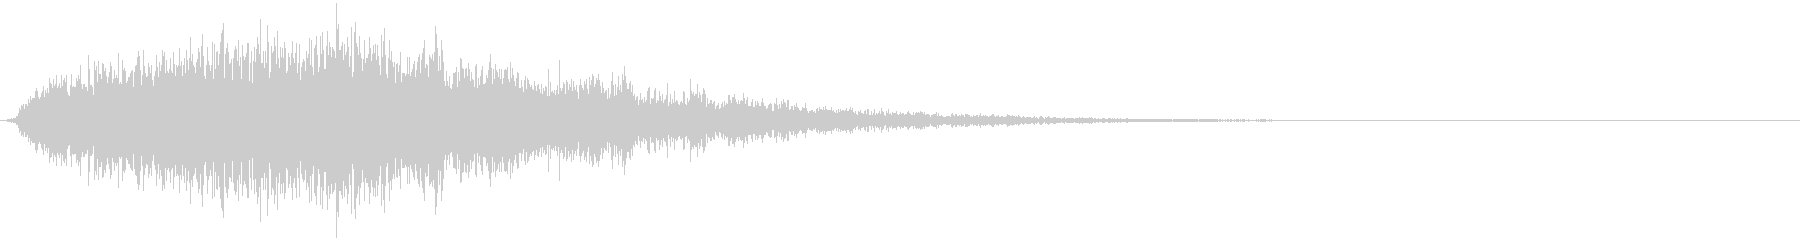 CINEMATIC BRAAMS_01の未再生の波形